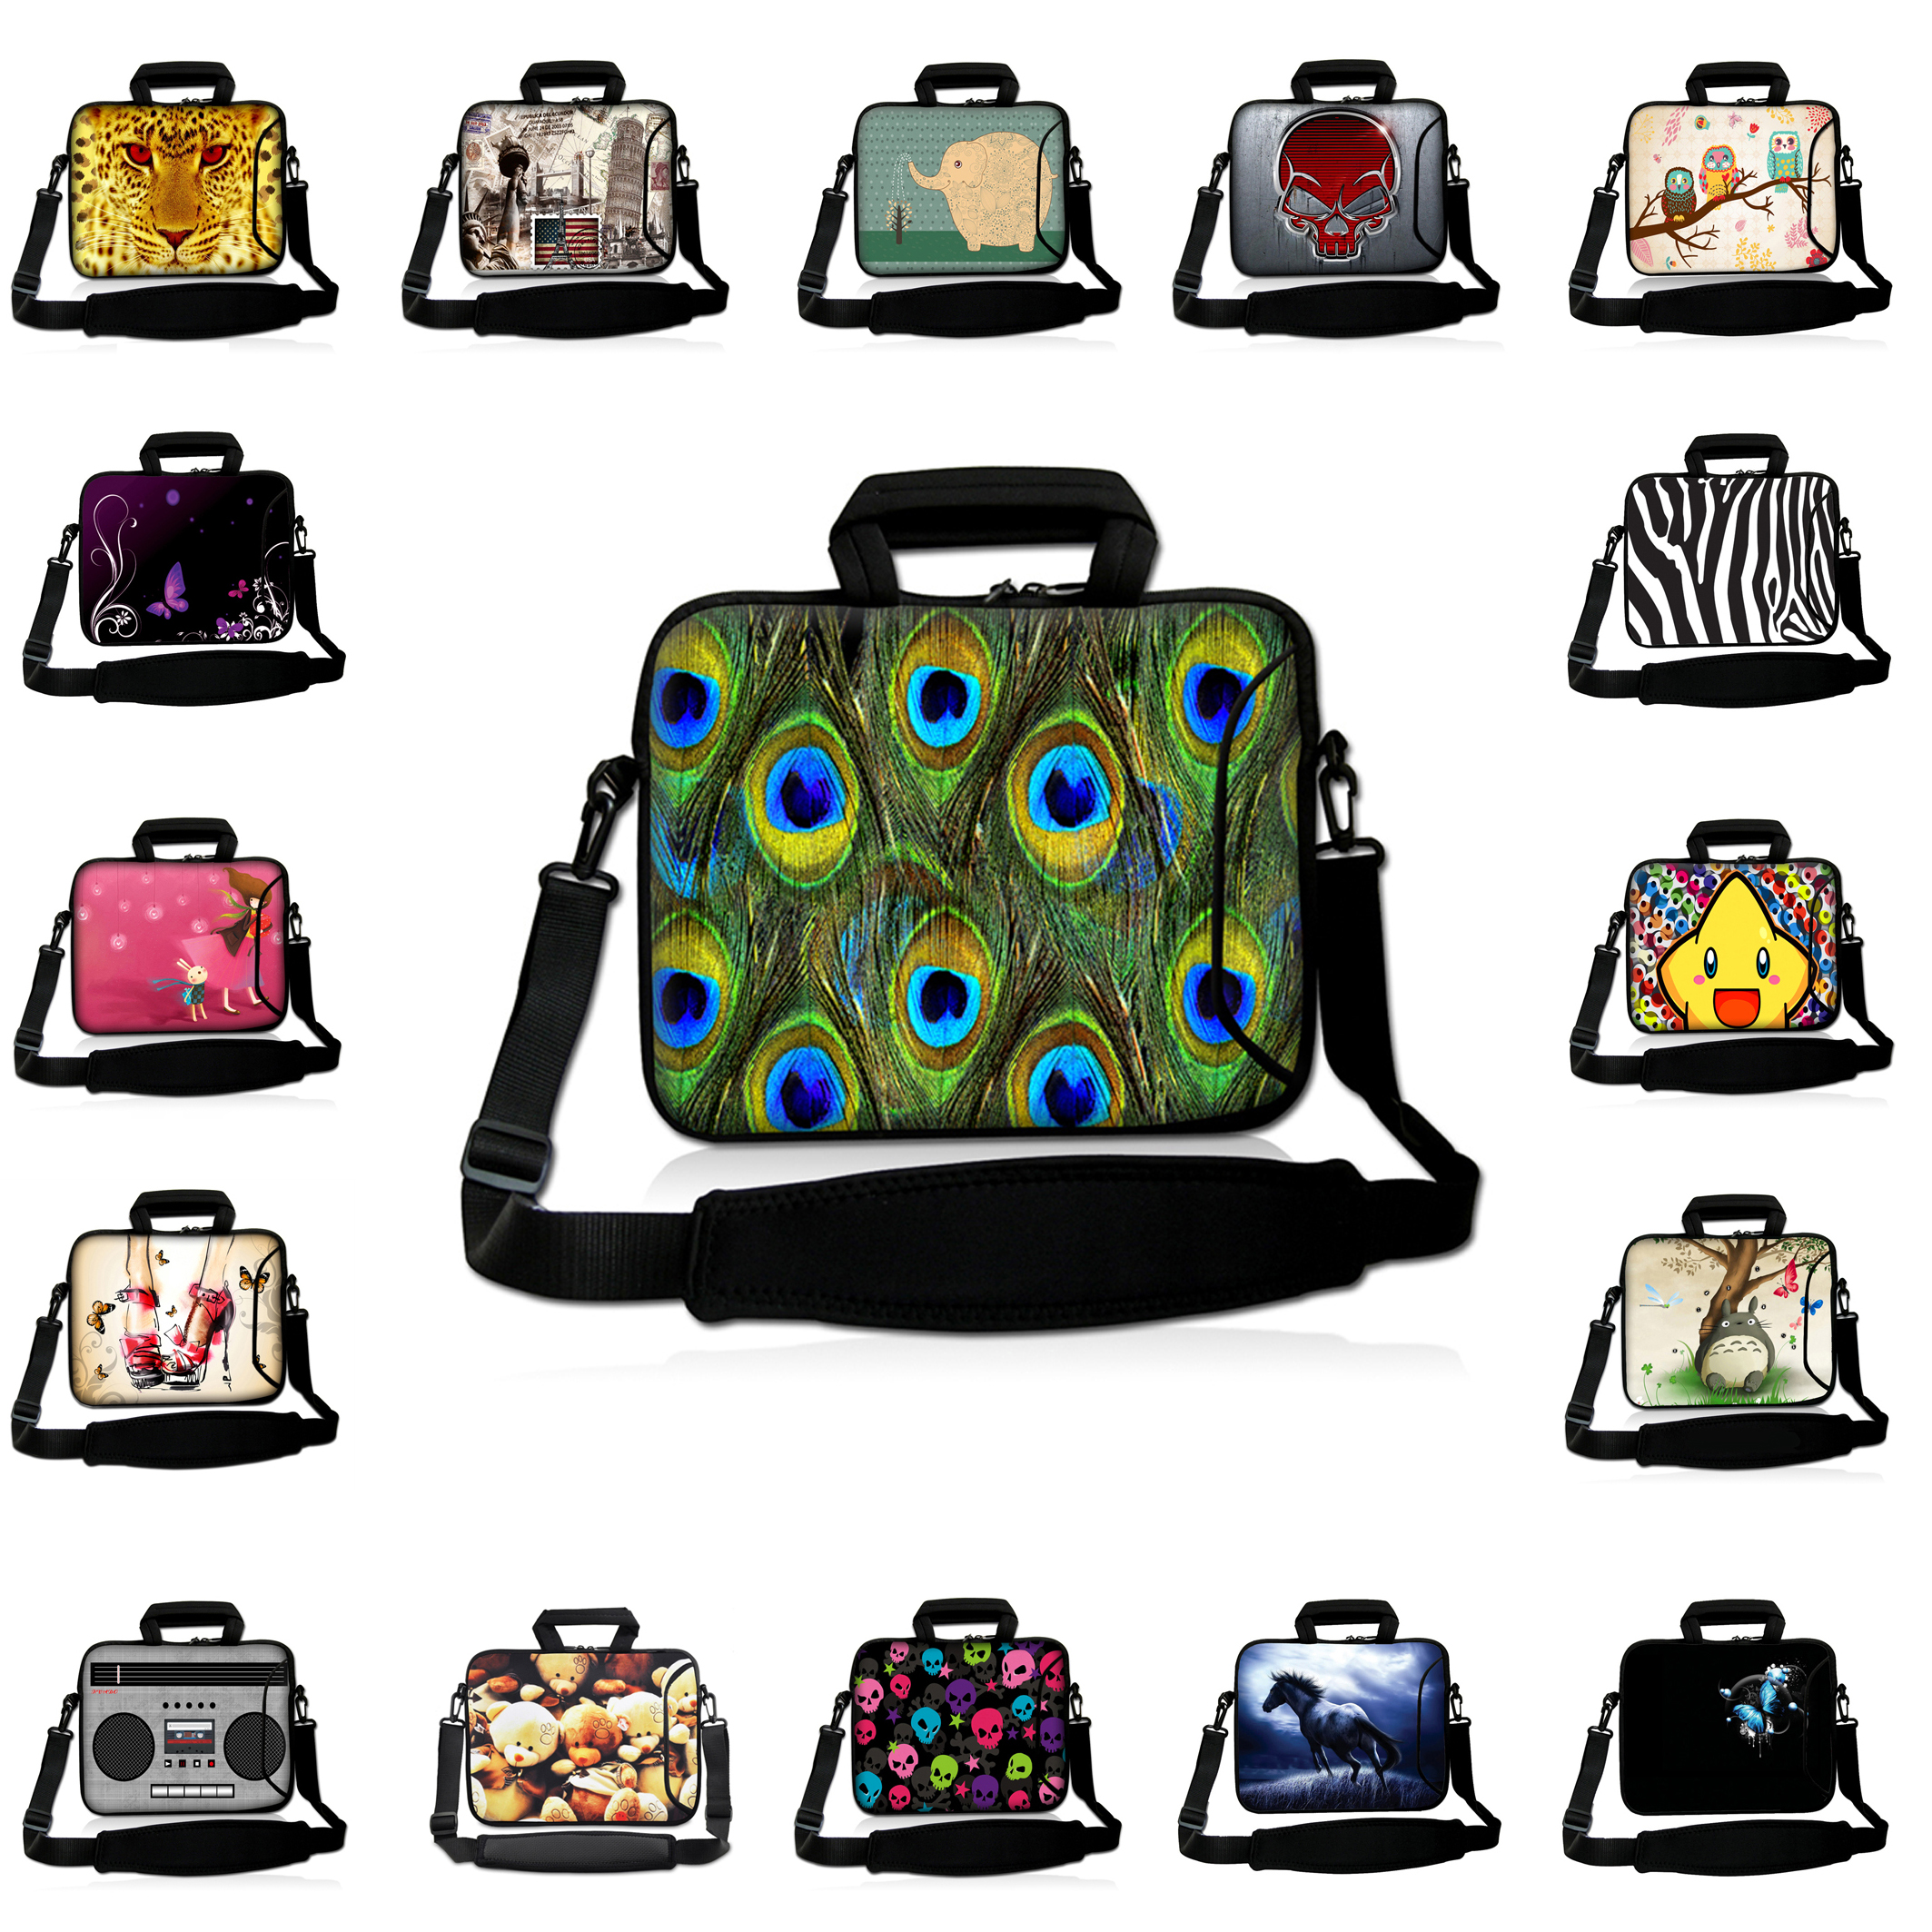 Shockproof Neoprene 10 12 13 14 15 17 inch Laptop Messenger Carry Bag Funda Portatil Bolsas Hot Notebook Bags Bolsas Protector<br><br>Aliexpress